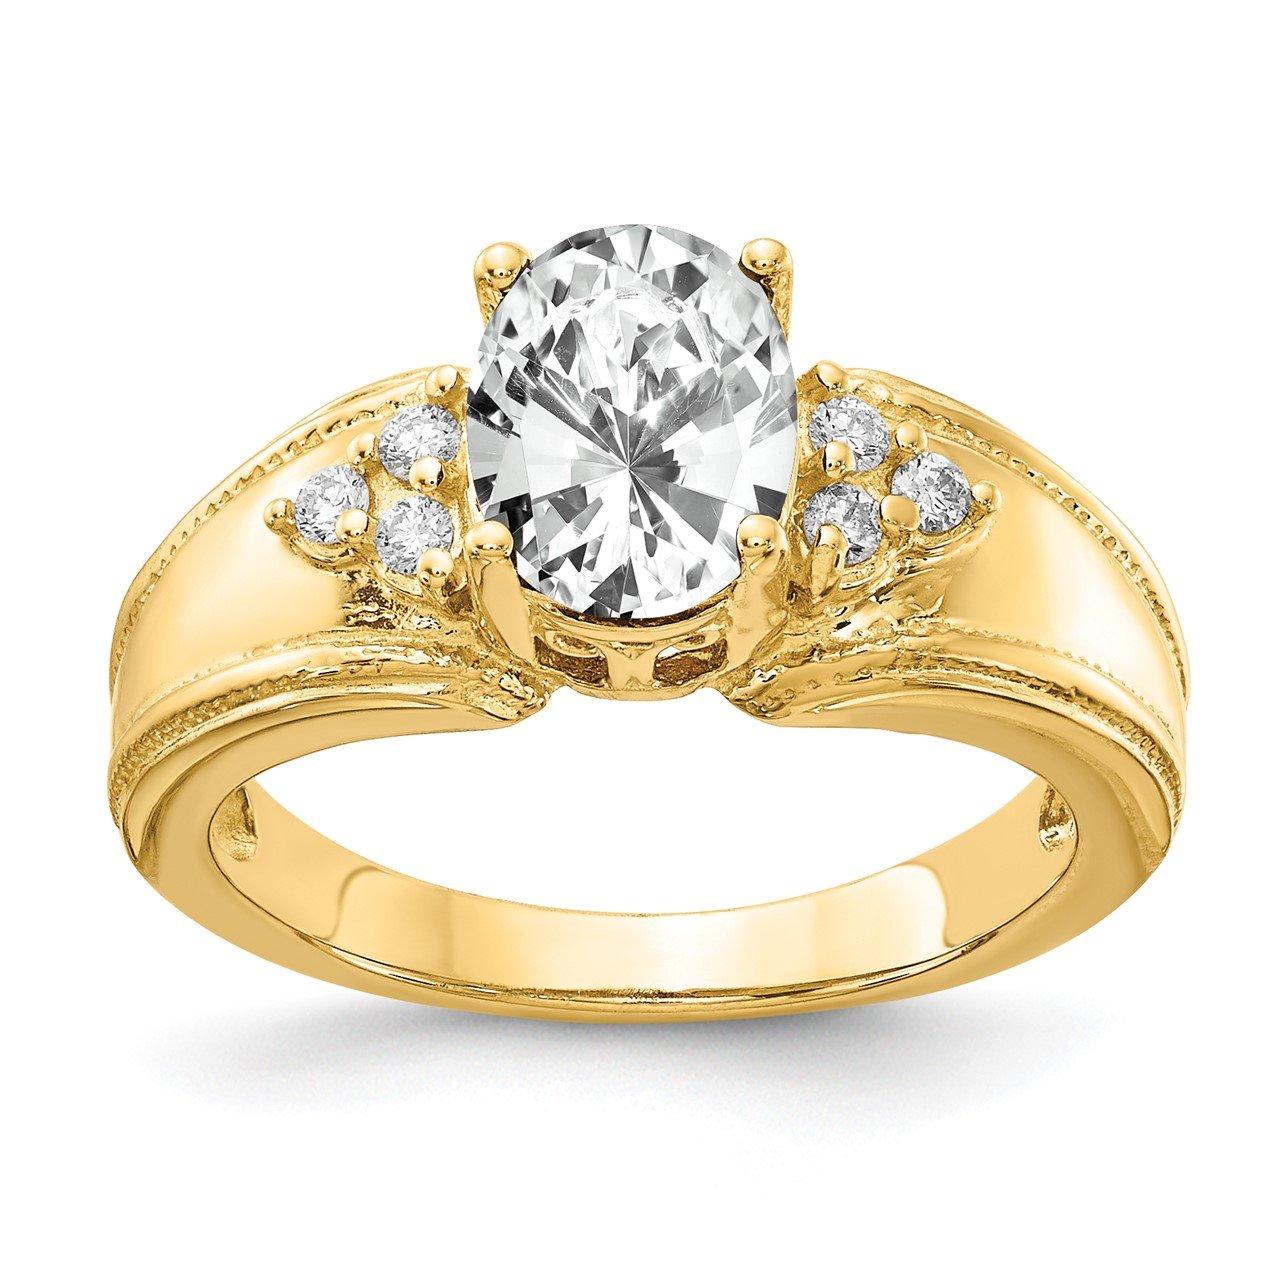 14k 8x6mm Oval Cubic Zirconia VS Diamond Ring